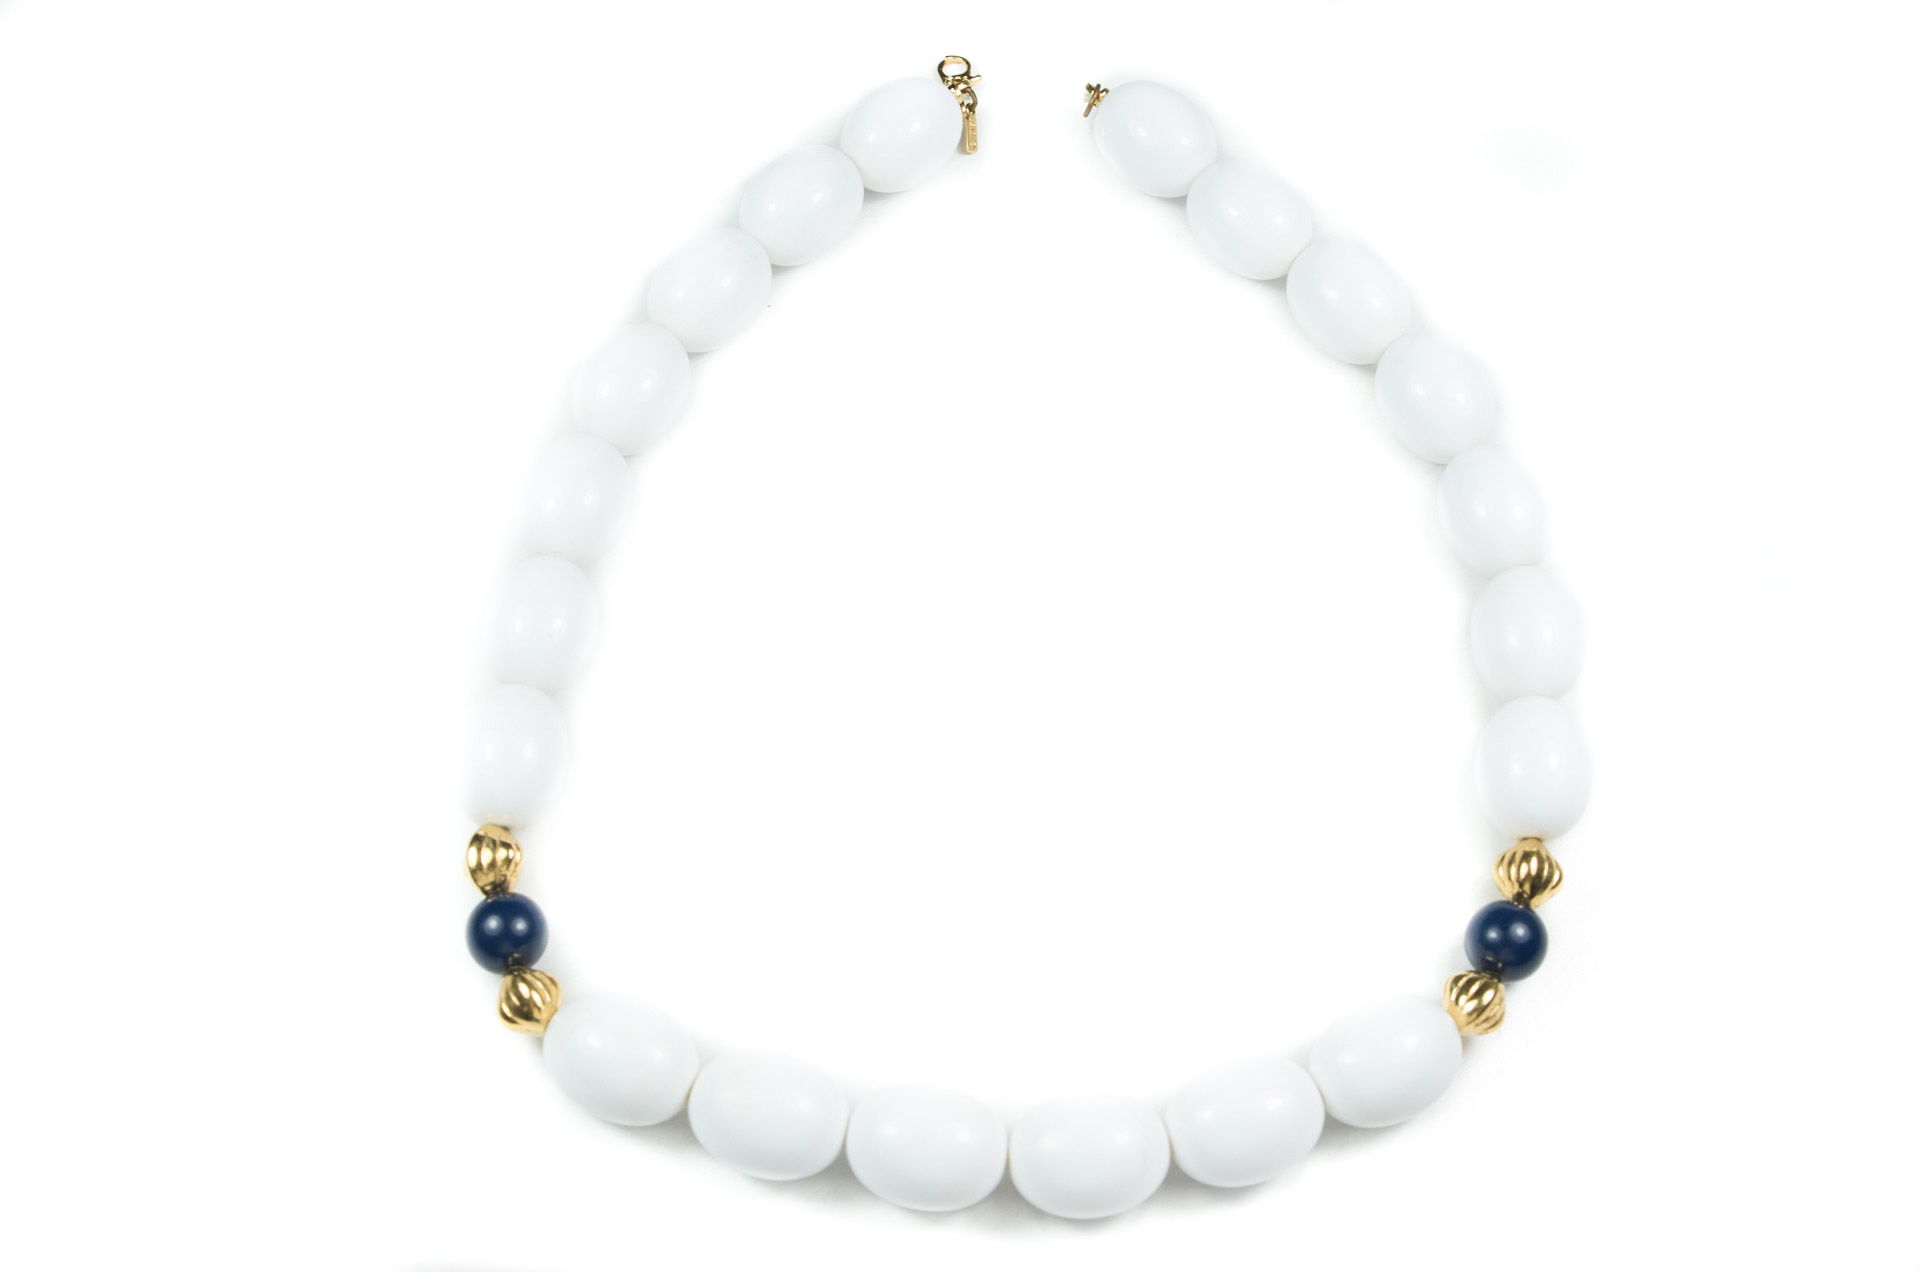 girocollo firmato monet perle bianche 1